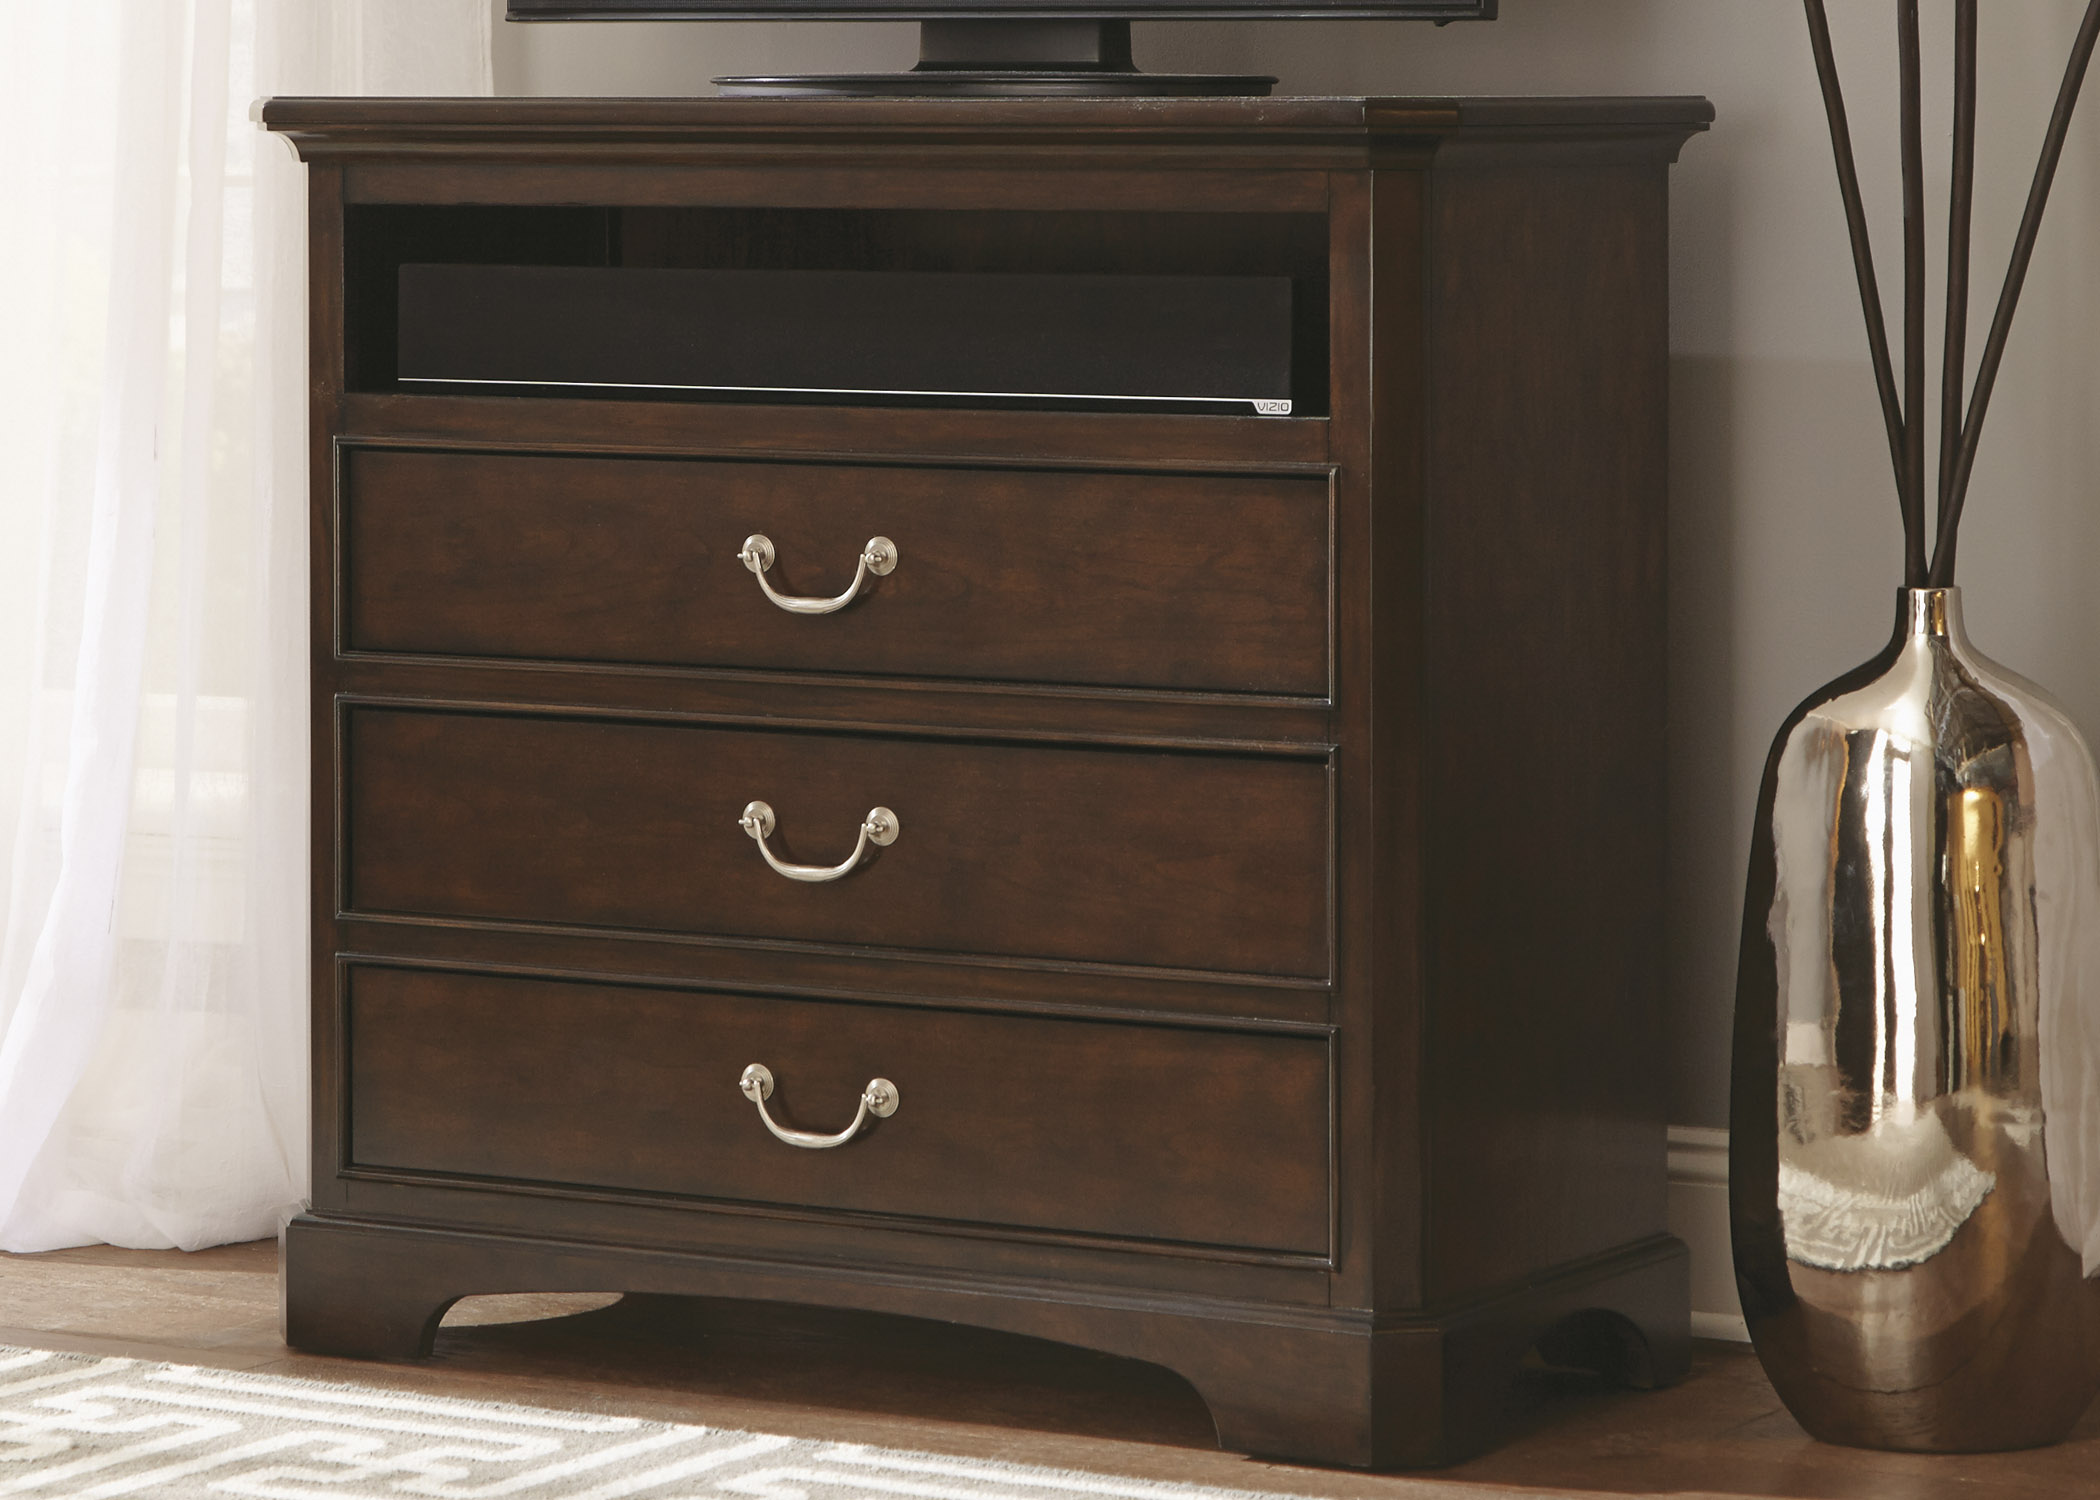 Liberty Furniture Avington 3-Drawer Media Chest - Item Number: 172-BR45